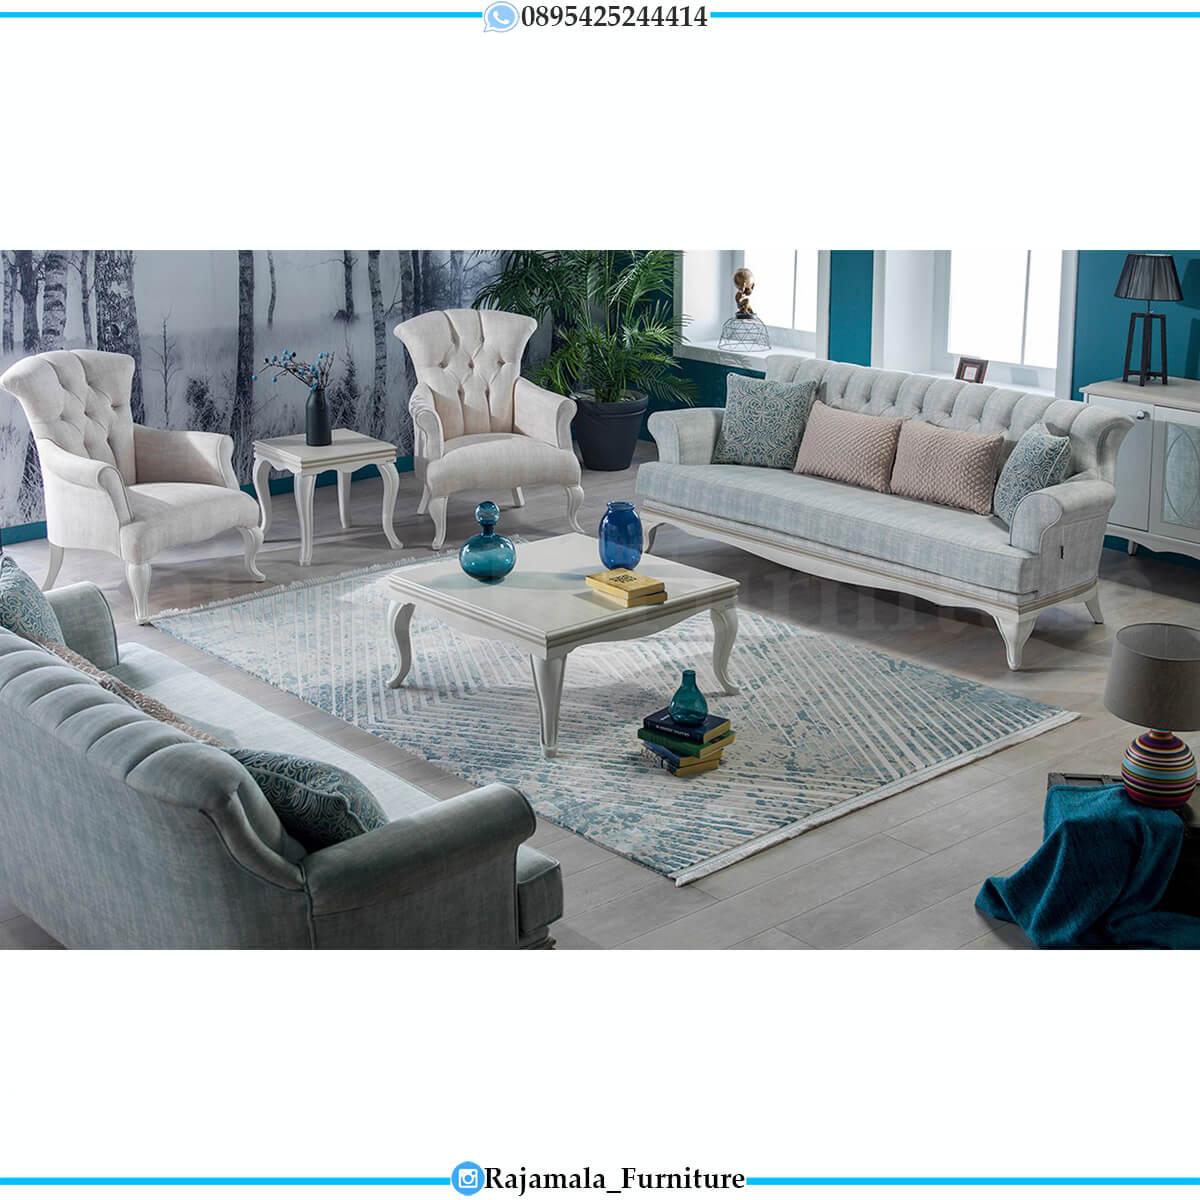 Sofa Tamu Minimalis Putih Duco Furniture Jepara Luxury RM-0615